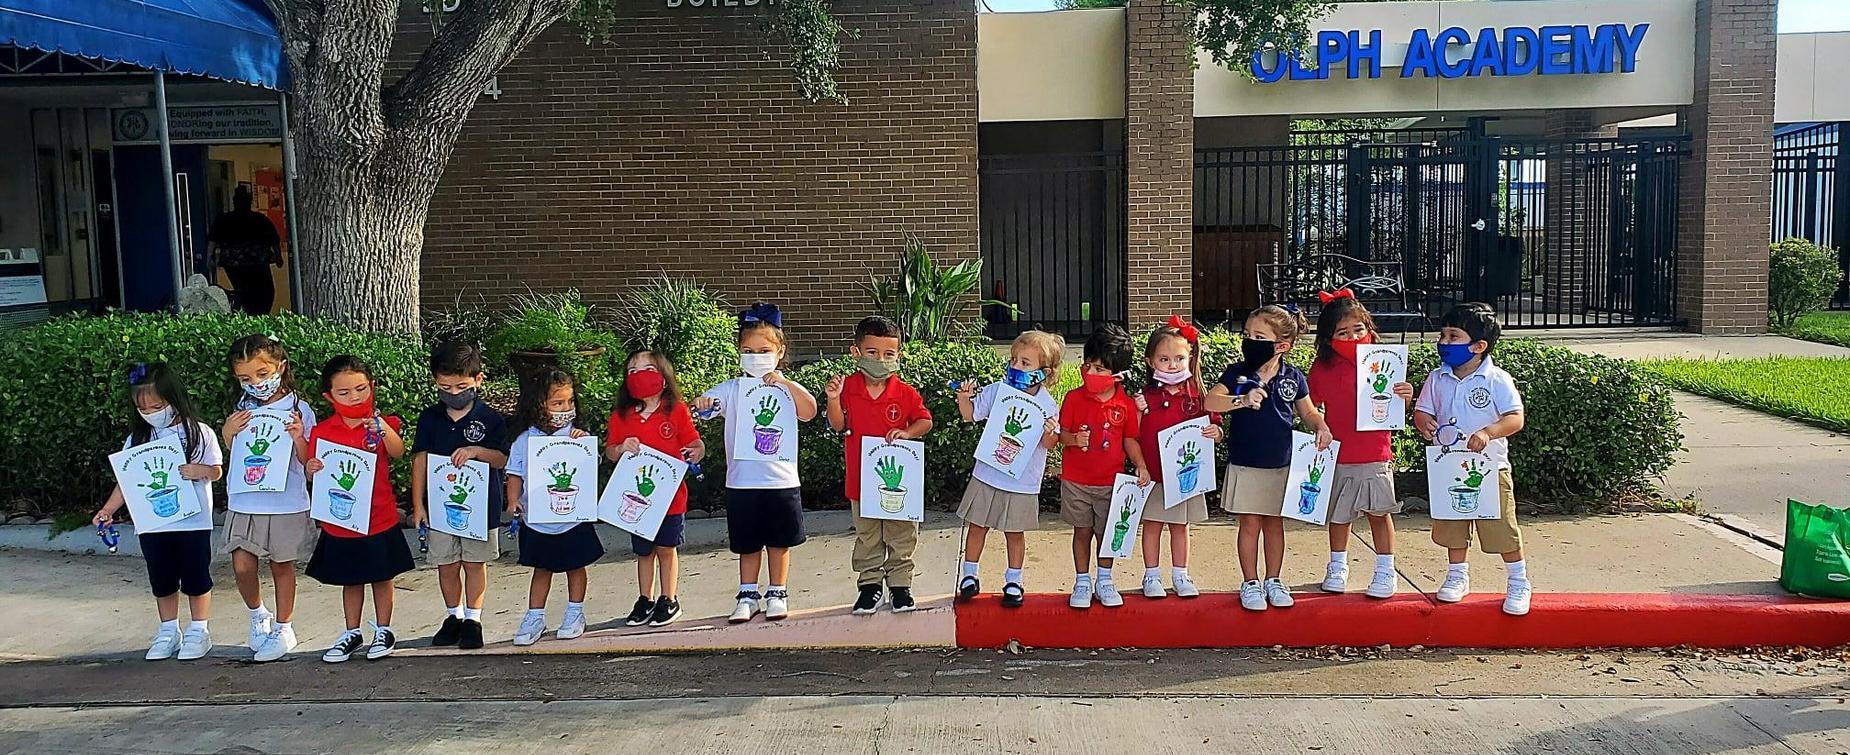 Children for parade